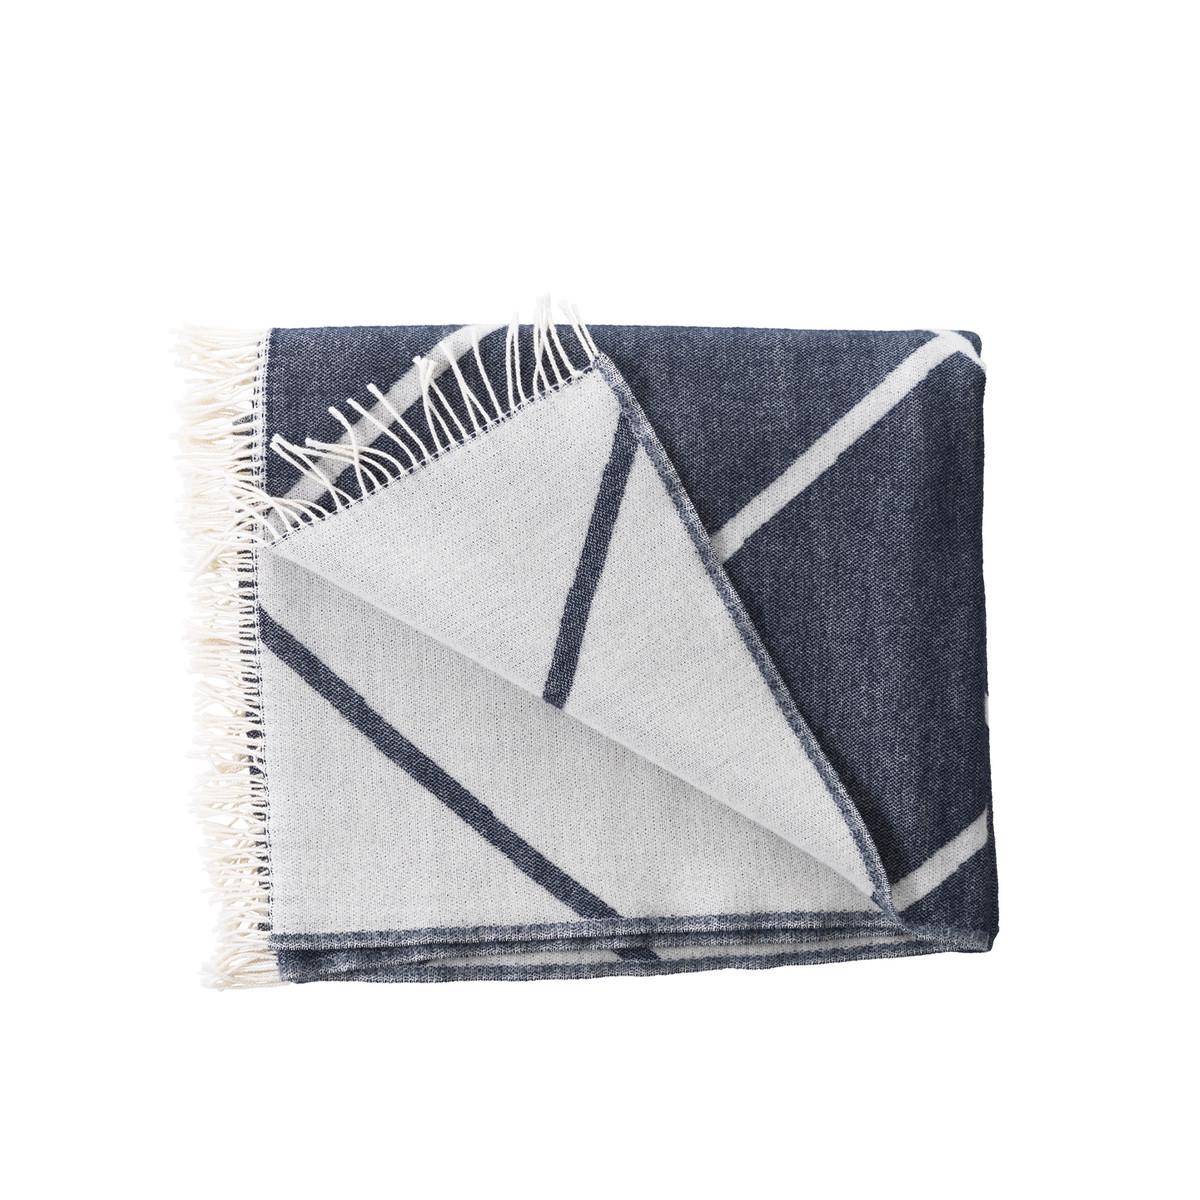 by lassen mesch wolldecke navy blau navy t 140 b 210. Black Bedroom Furniture Sets. Home Design Ideas